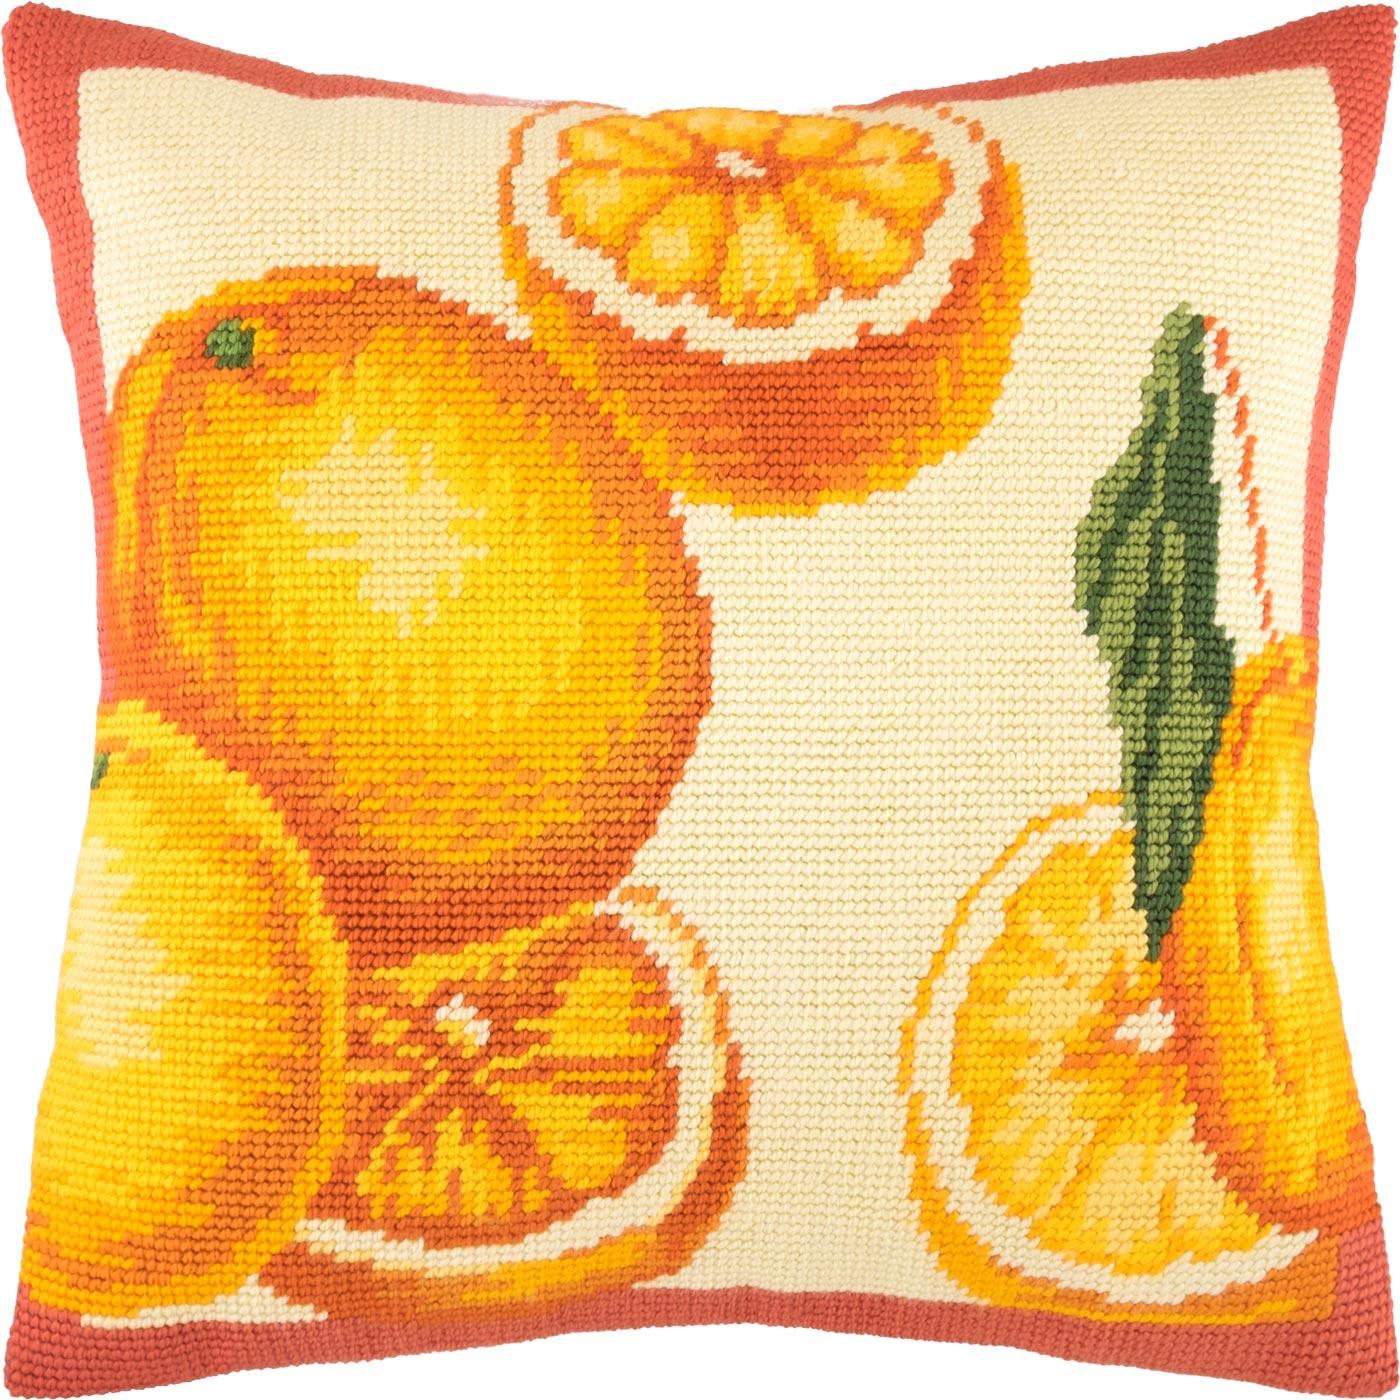 V35 — Апельсини